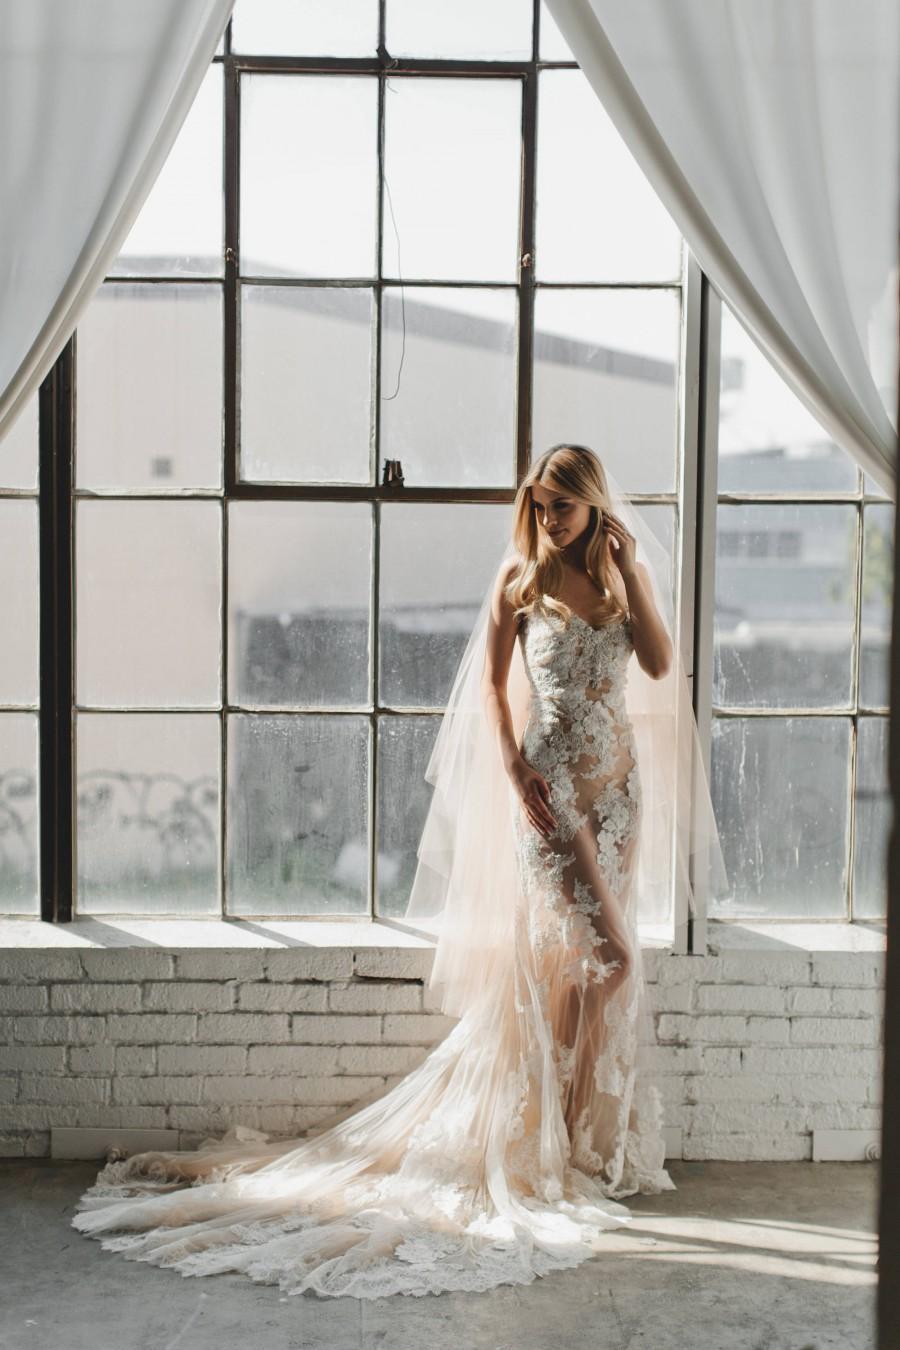 Boda - Wedding Veil, Champagne Veil, Ballet Length Tulle Veil, Bridal Veil, Tulle Veil, Double Double Layer Drop Veil #1701